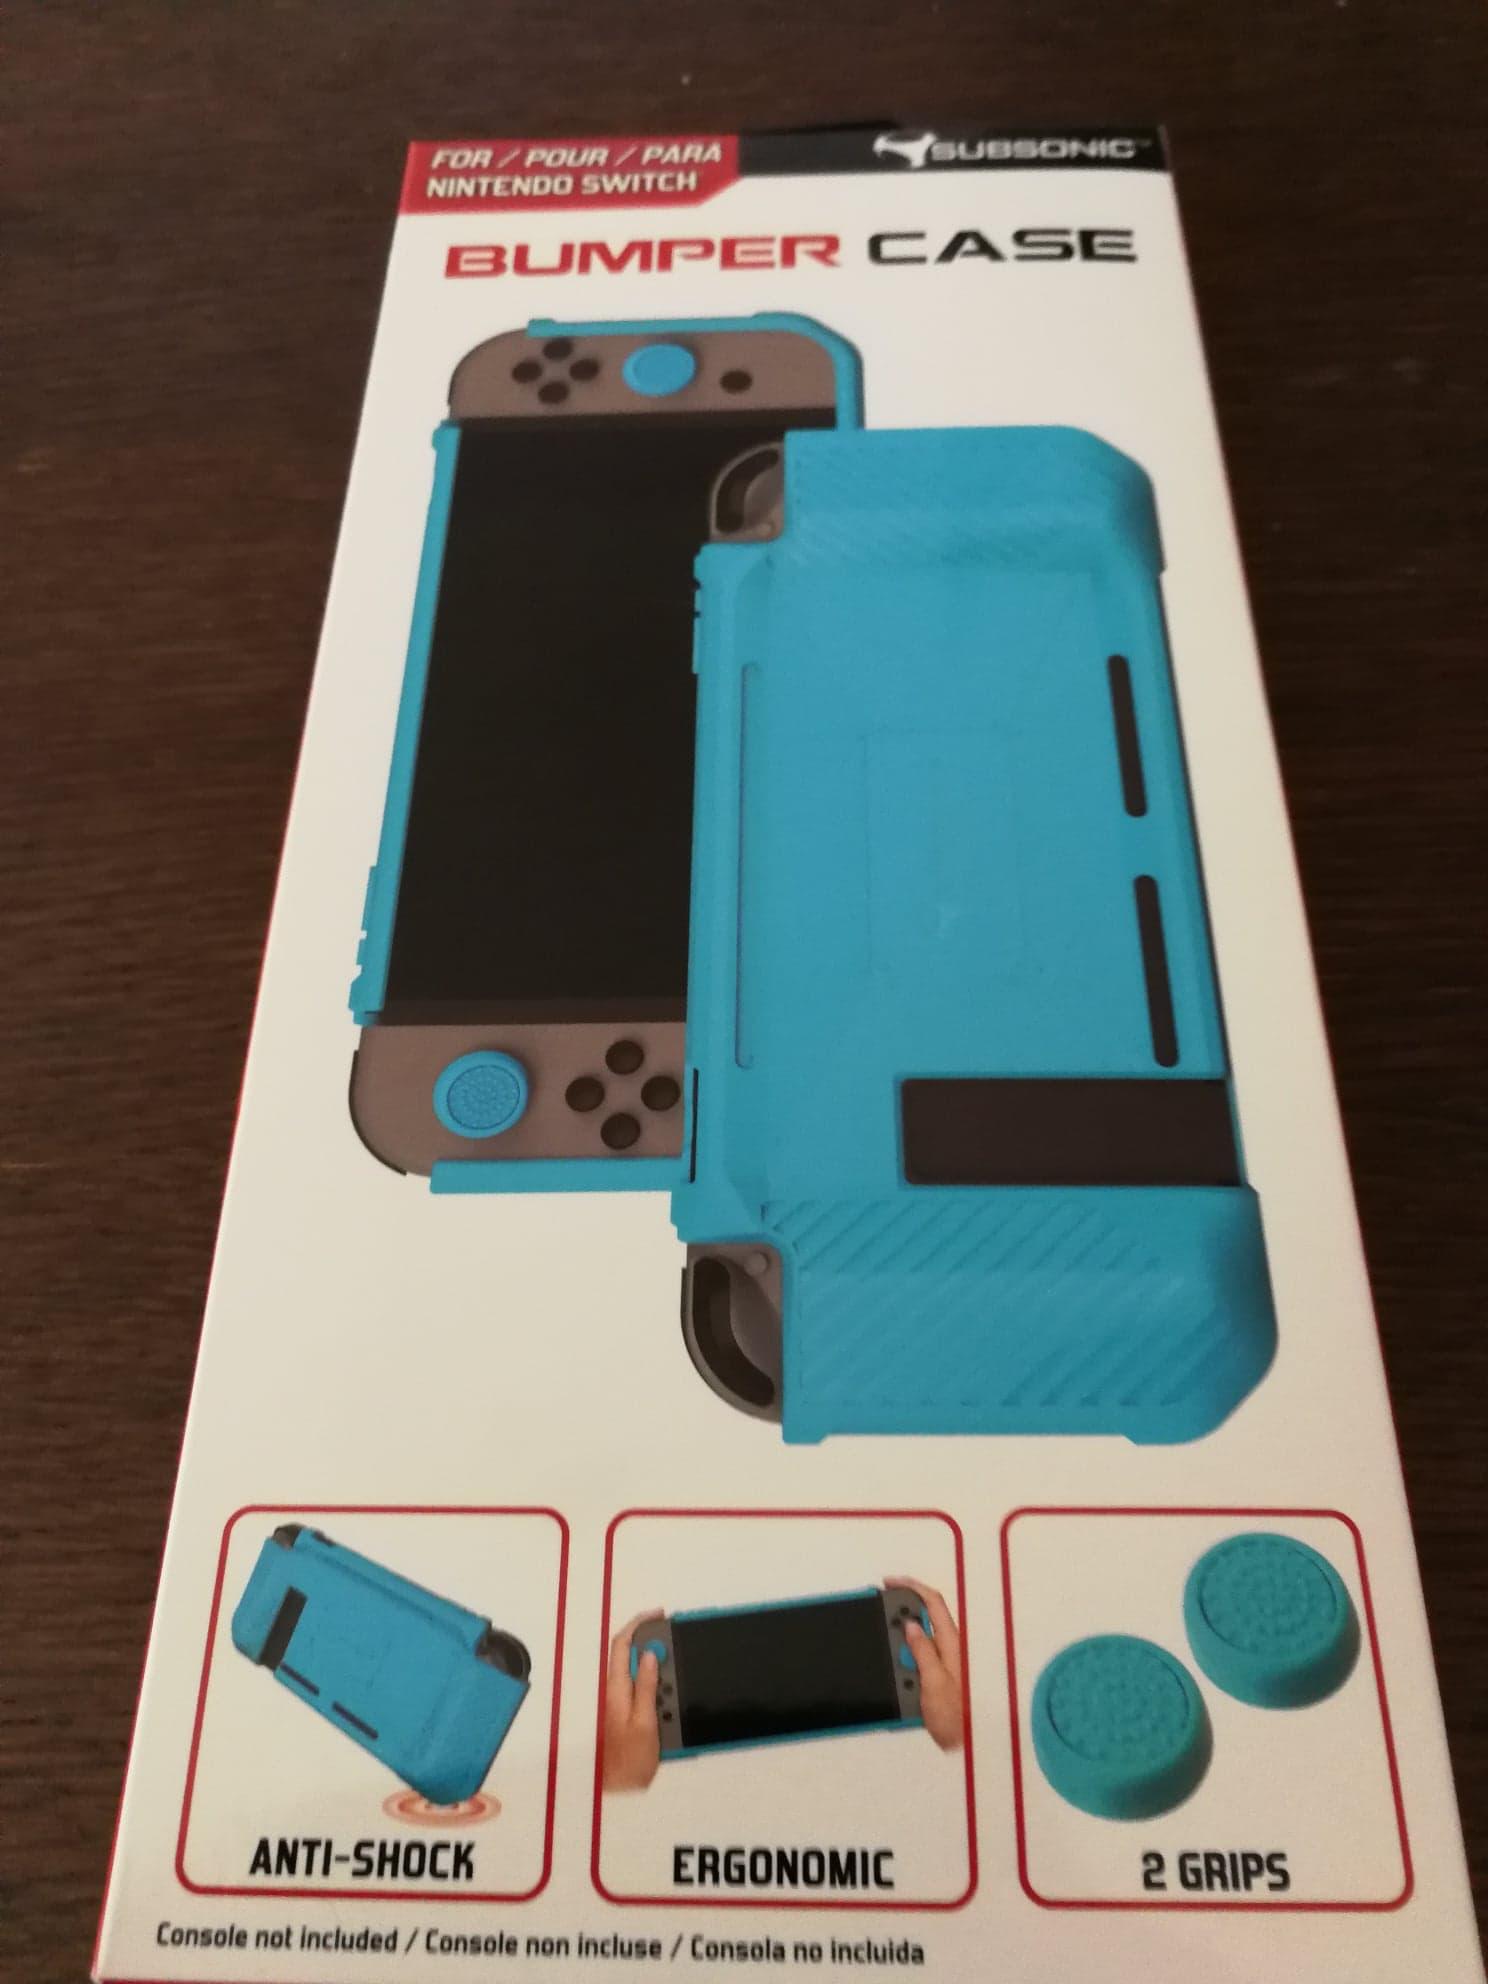 Emballage du Bumper Case